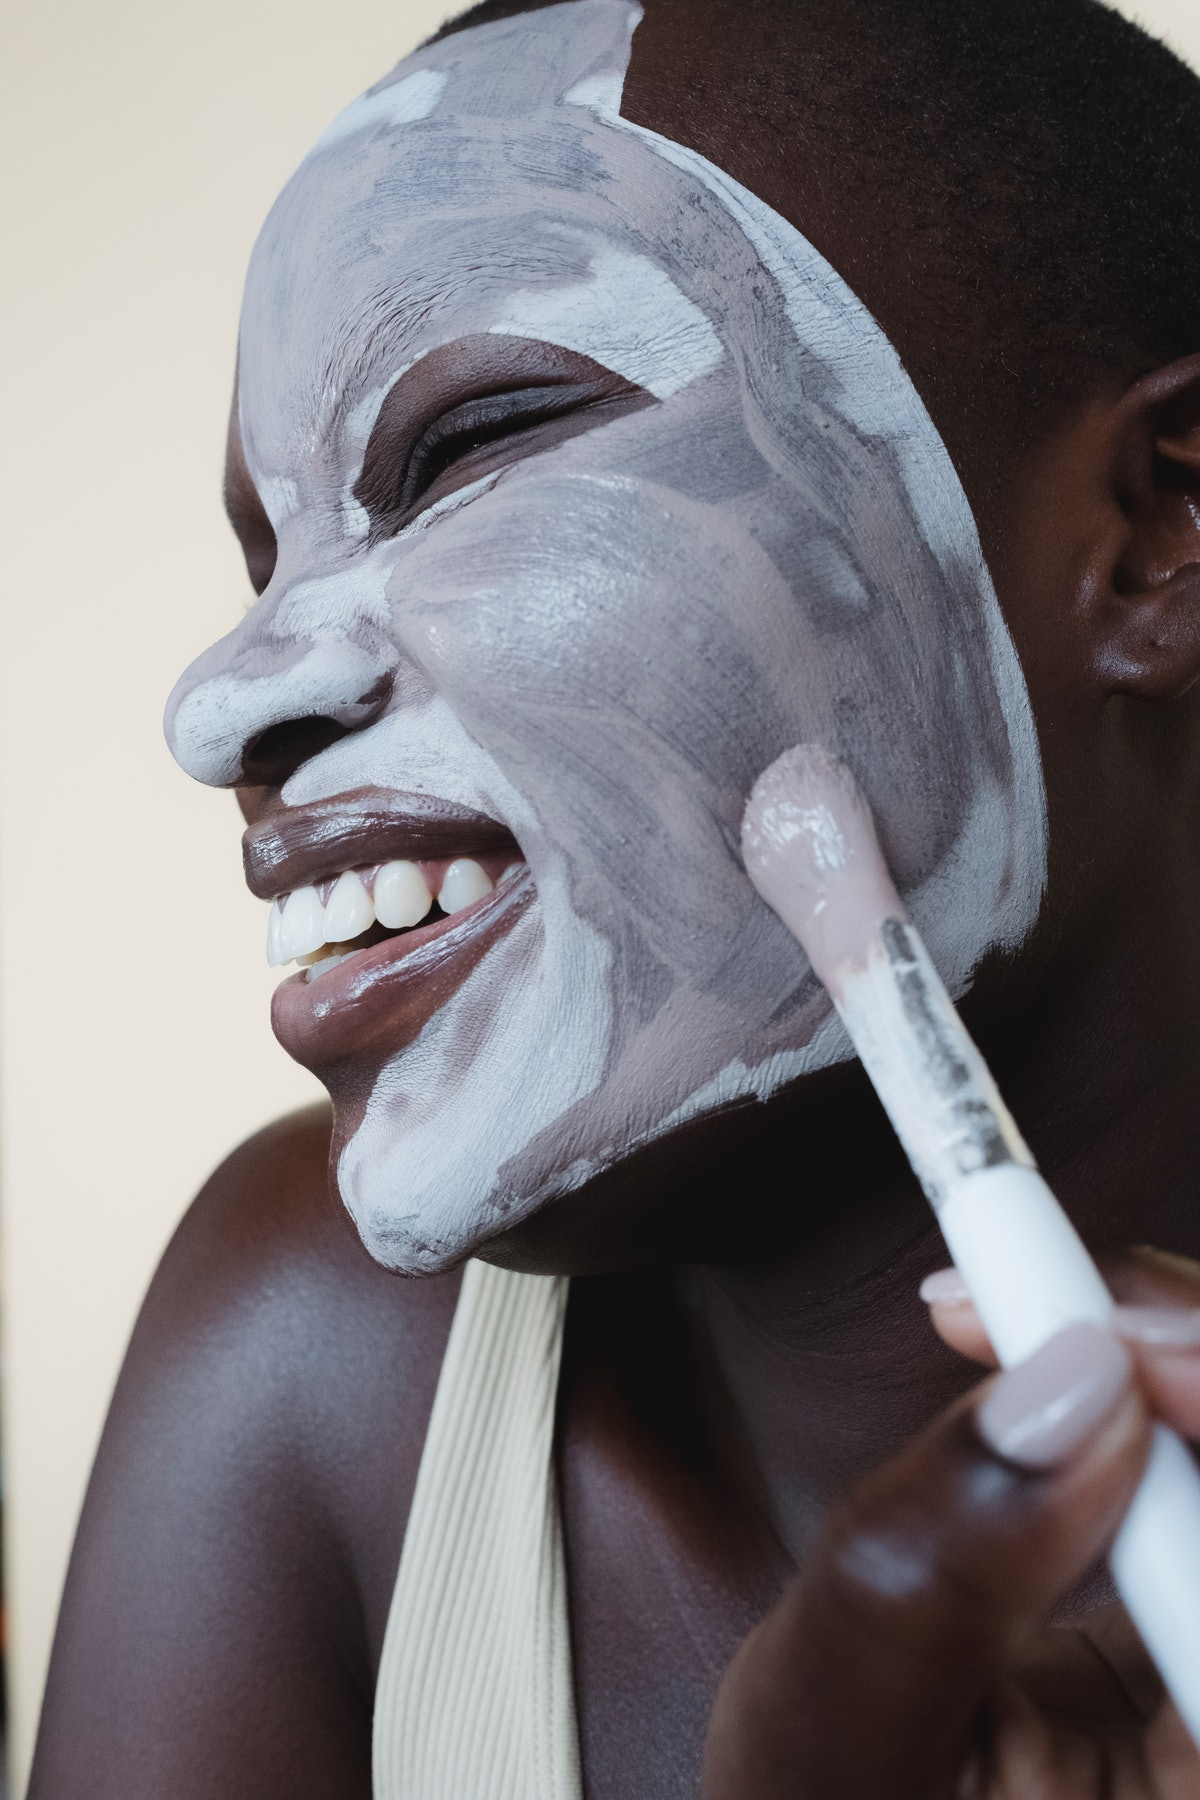 Hanahana Beauty Skin Nutrition Face Mask